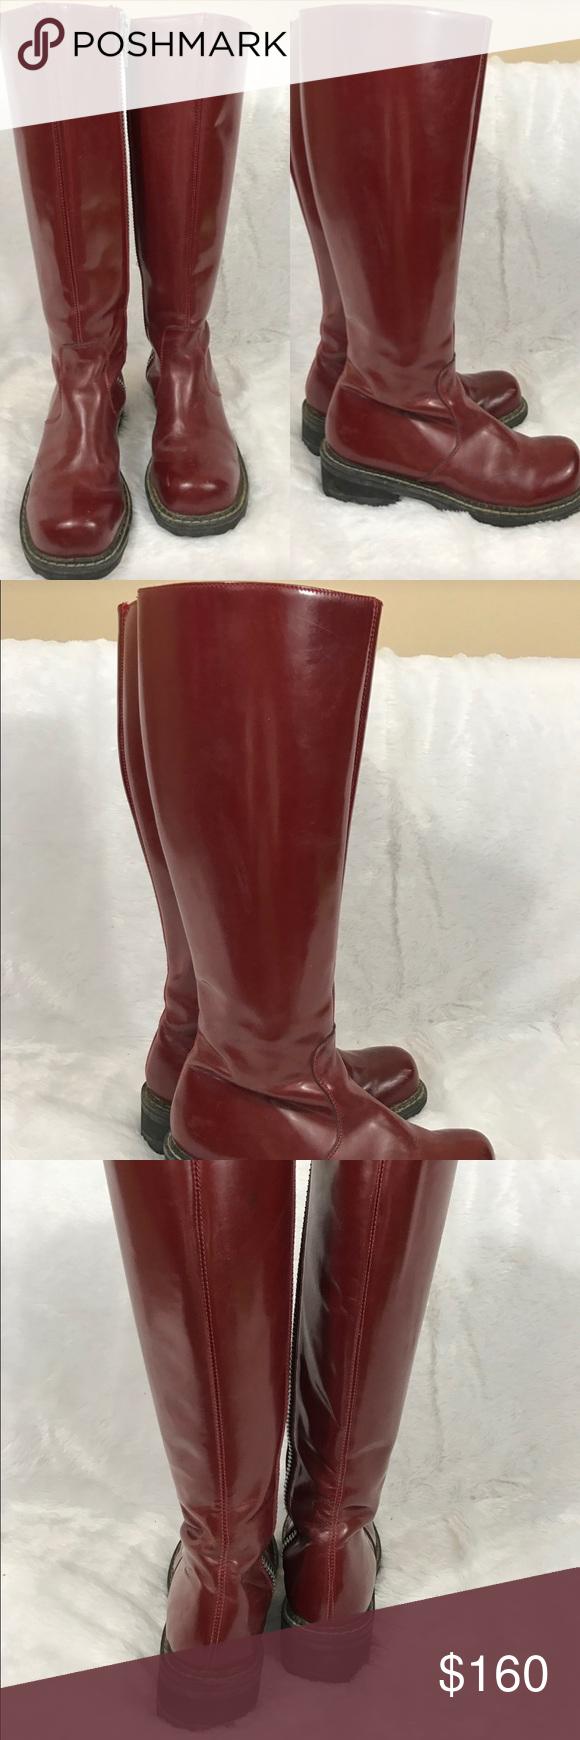 John Fluevog red burgundy boots Great condition! Super high quality and durable john fluevog Shoes